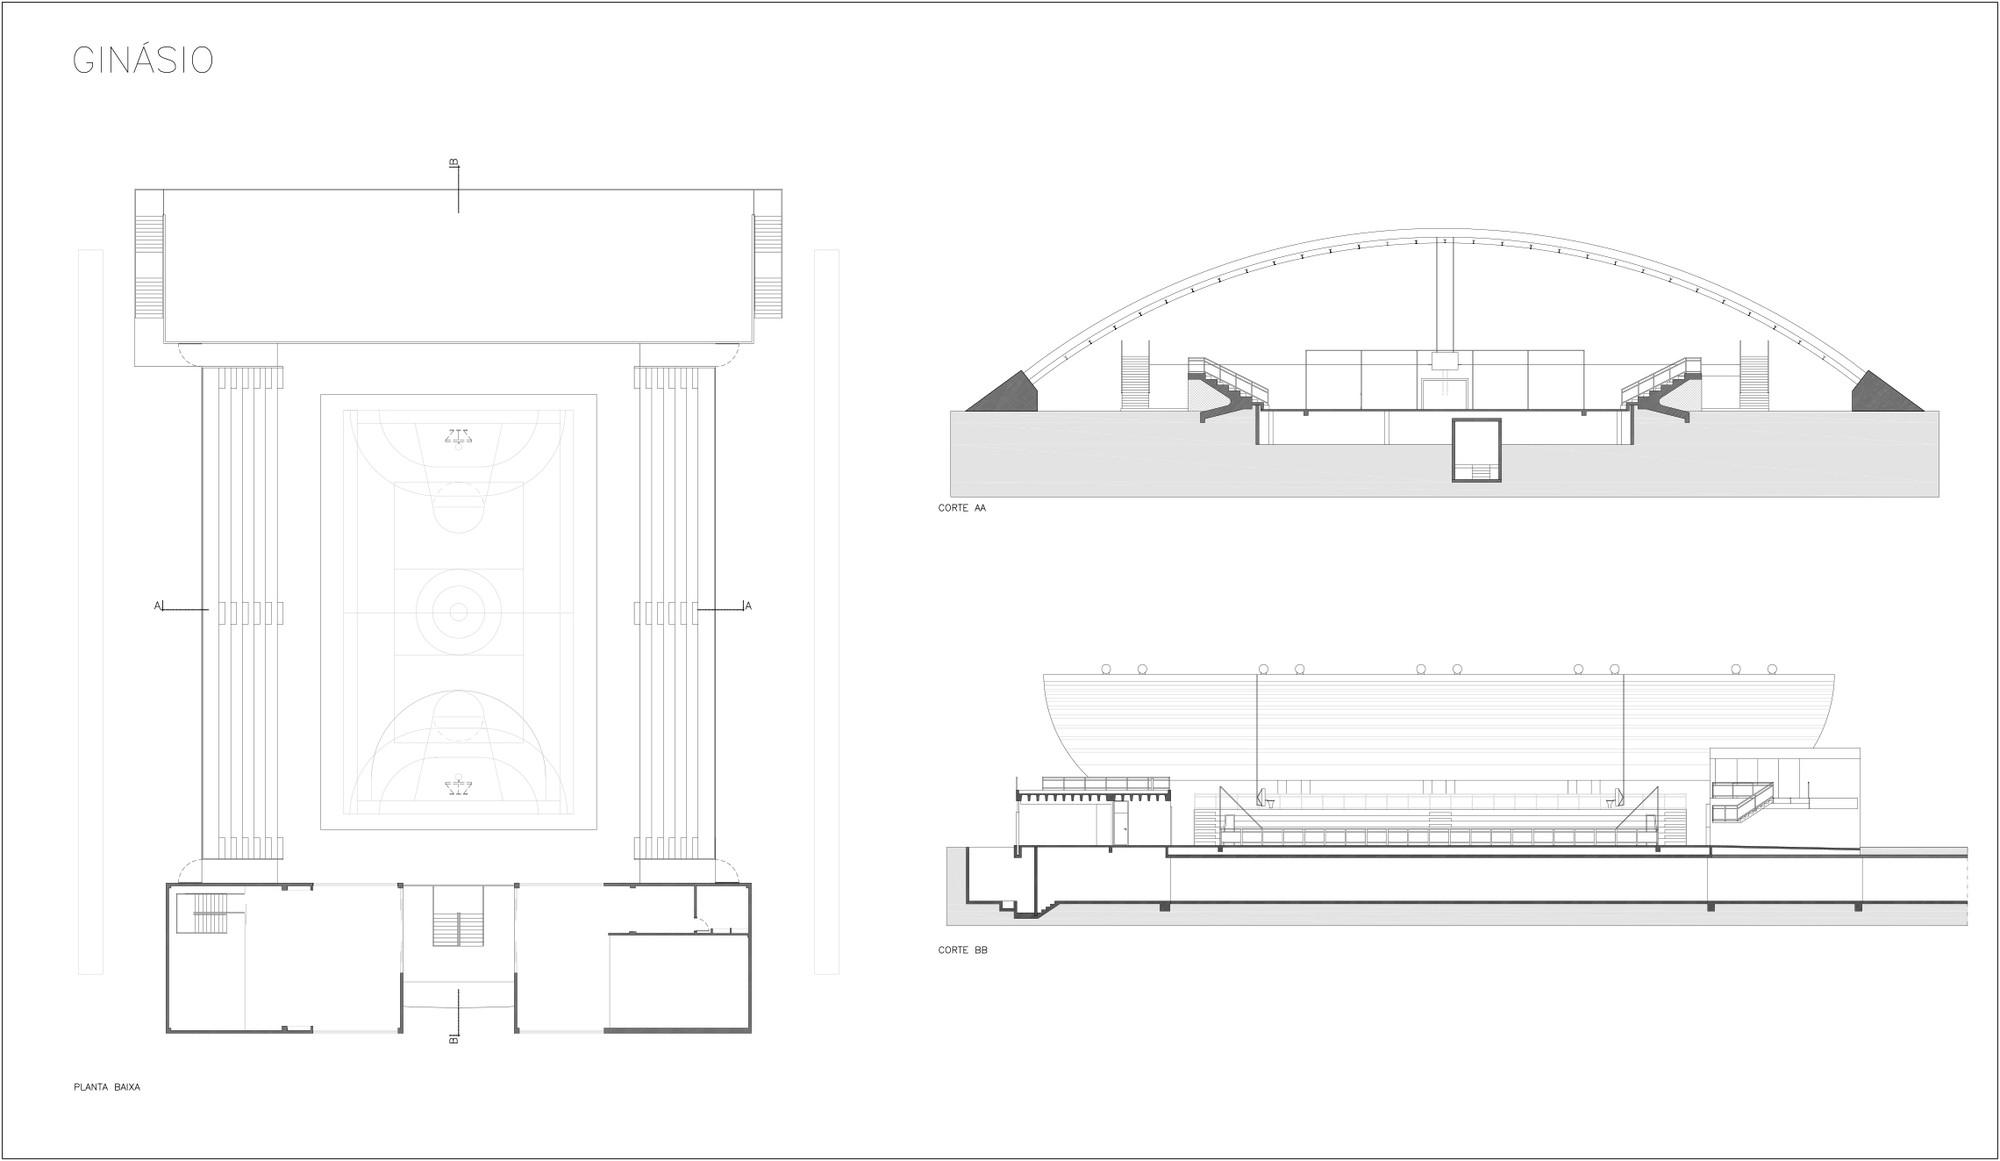 Gallery Of Sesc Barra Secondary School Indio Da Costa Arquitetura 24 Uzi Schematic Schooldrawings Gym